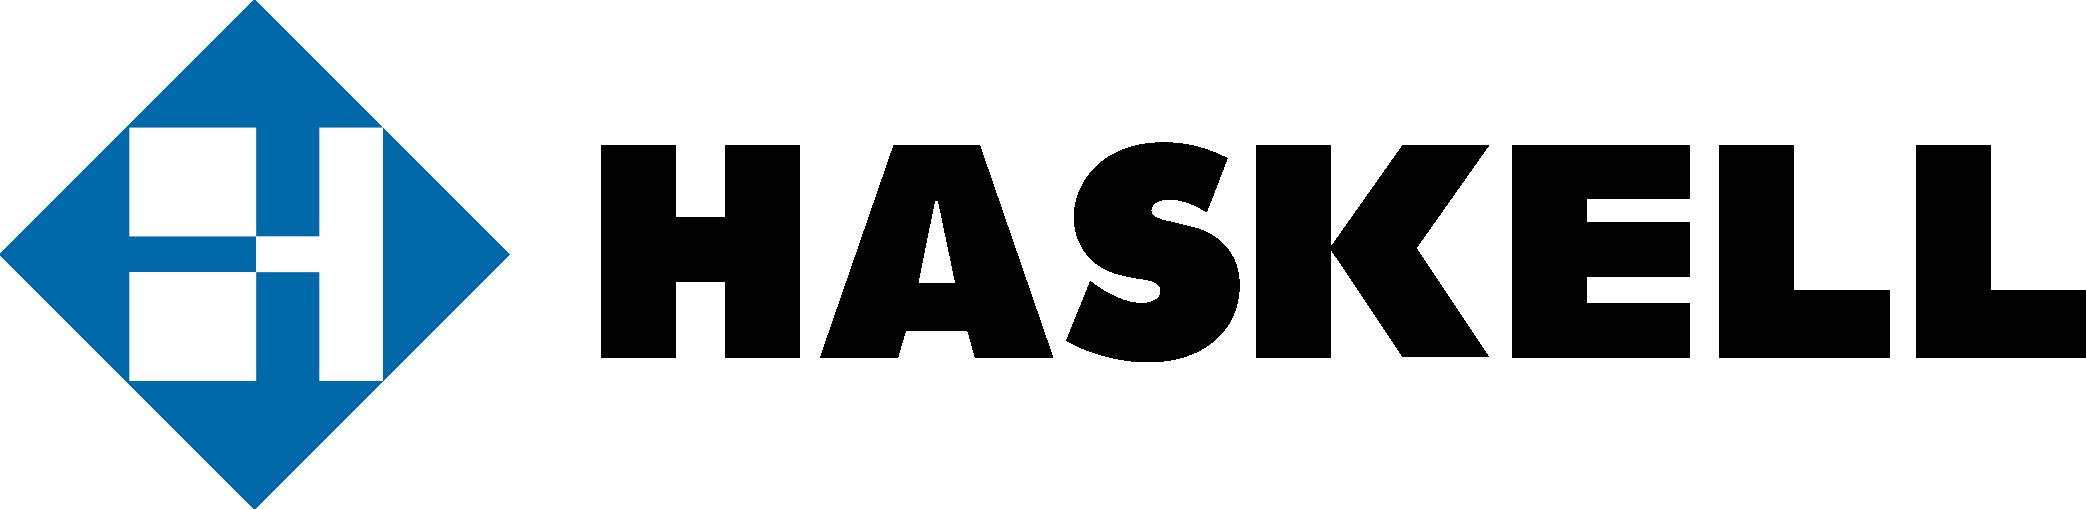 Latest Company Logo Design